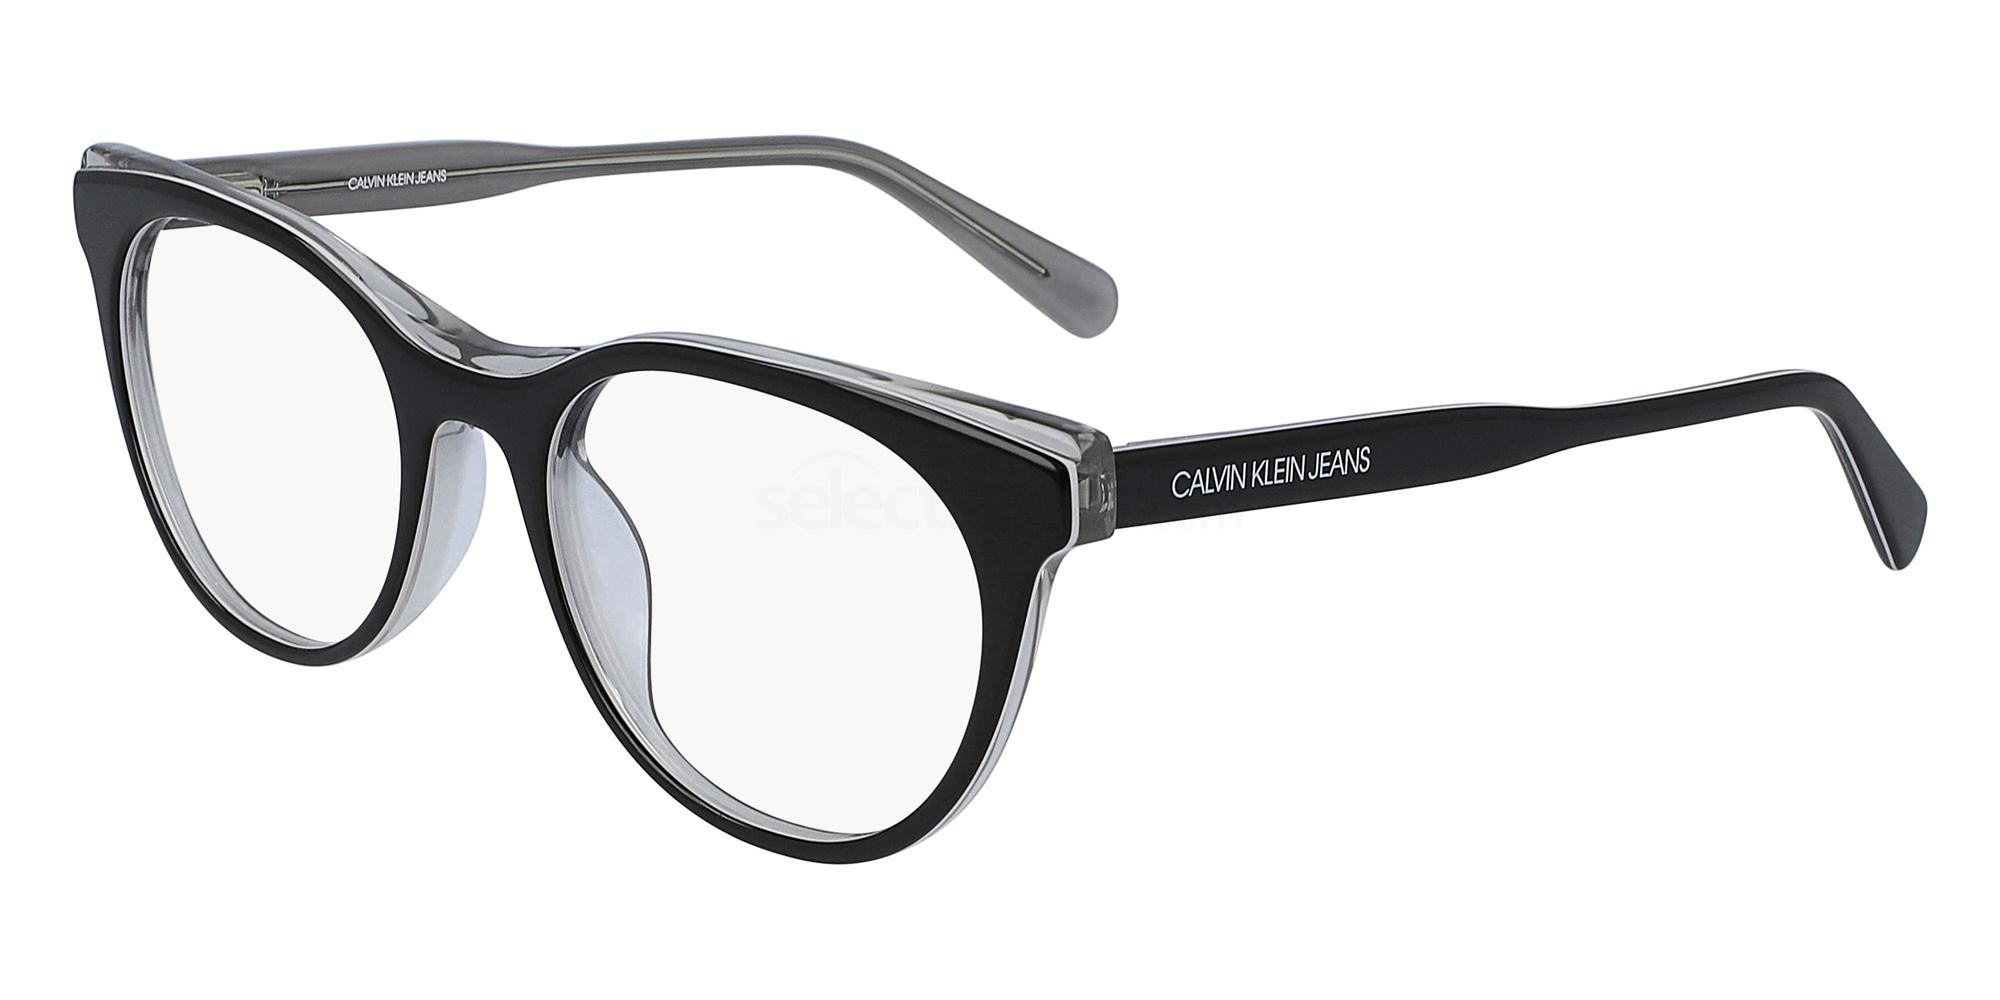 076 CKJ19511 Glasses, Calvin Klein Jeans